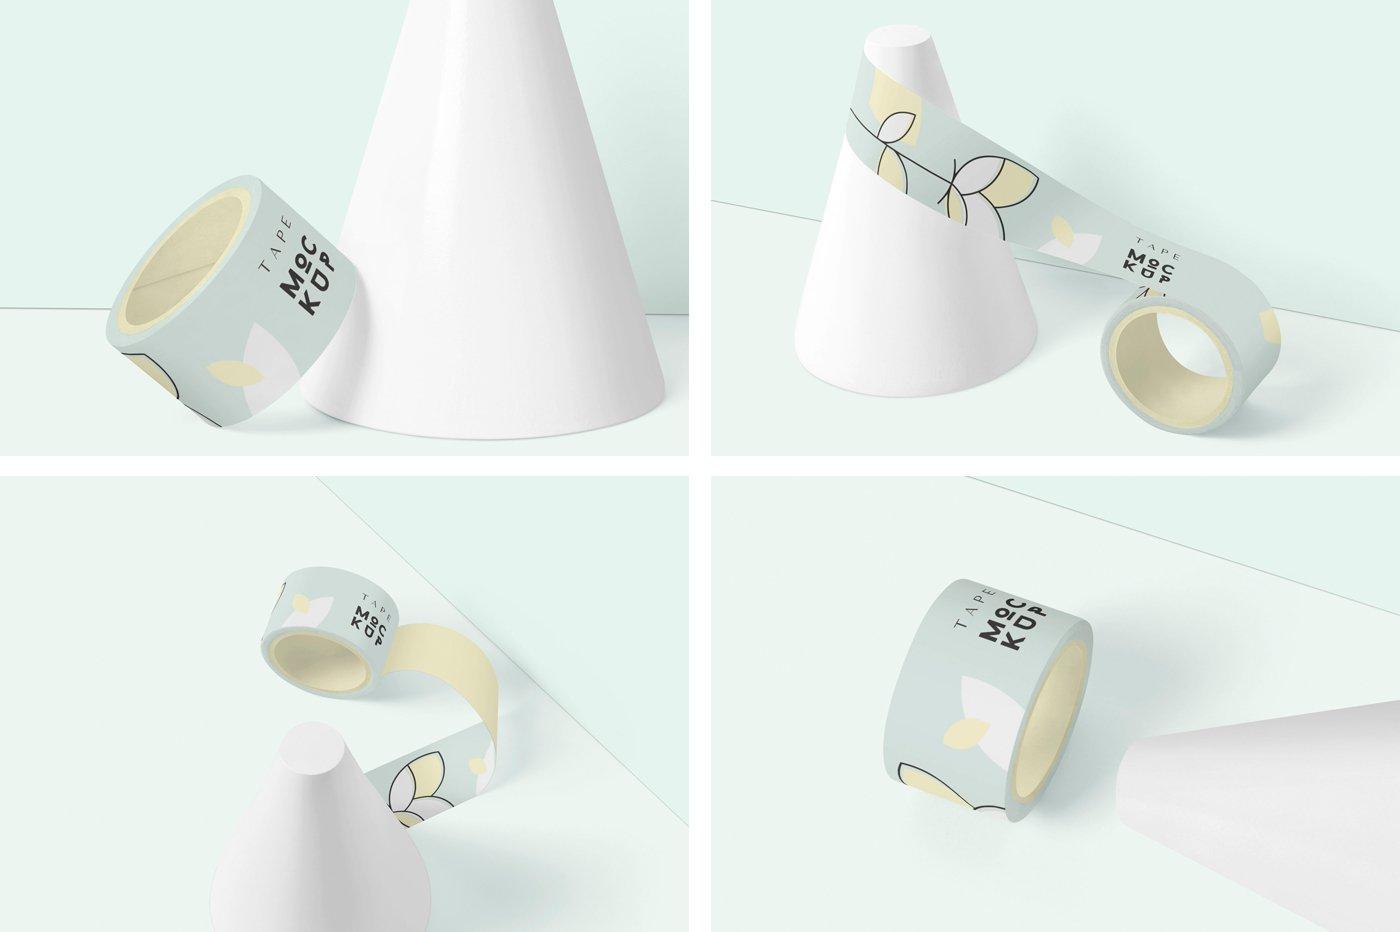 管状胶带设计展示样机模板 Small Packaging Tape Mockups插图(5)